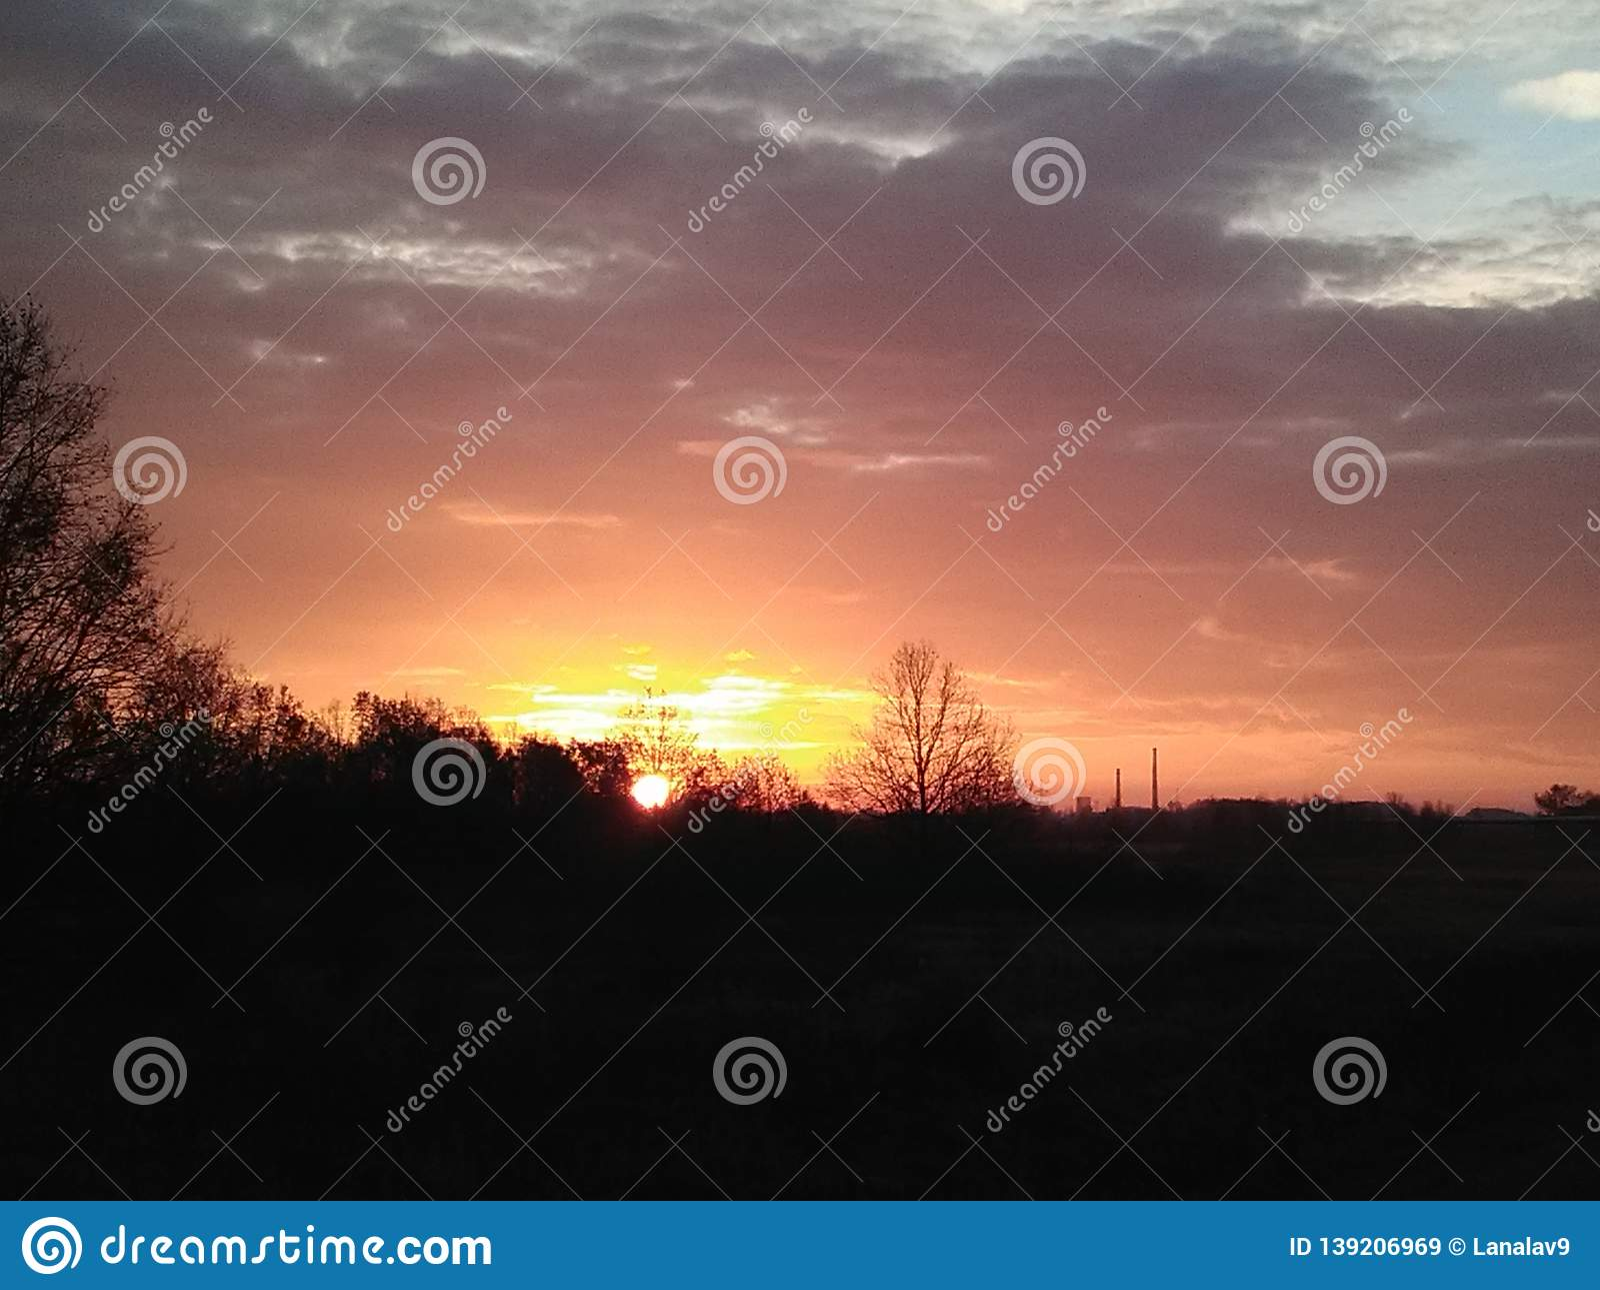 Sunrise is one of the greatest phenomena of nature